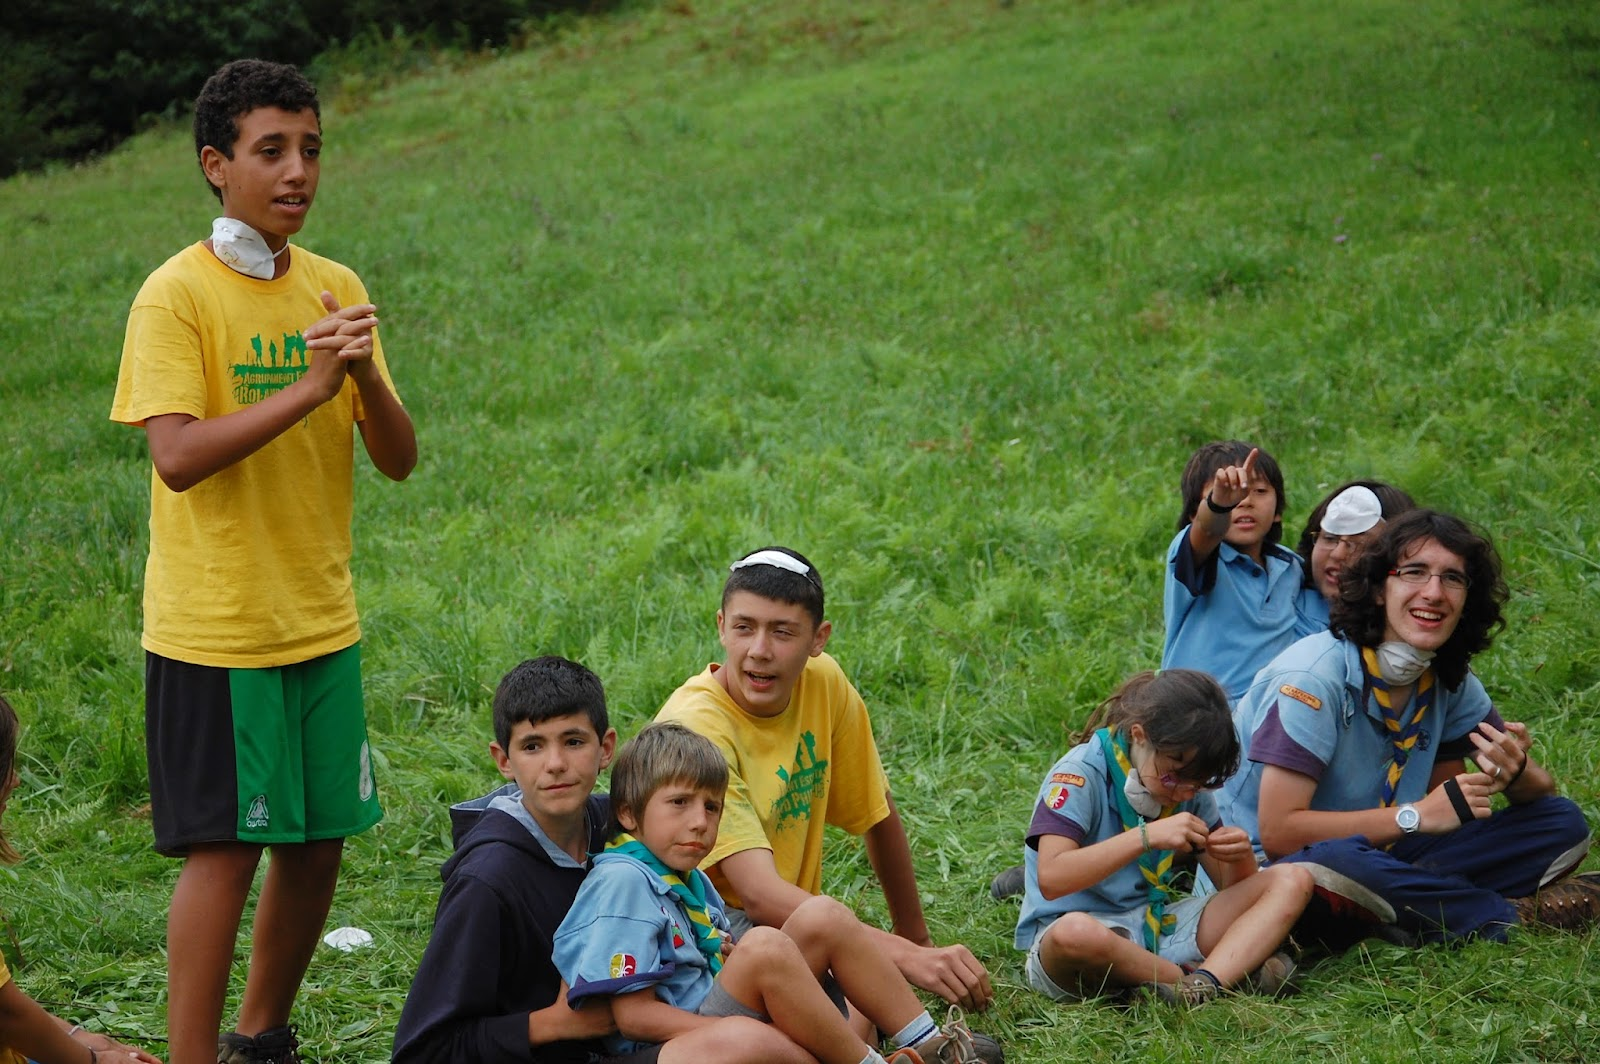 Campaments Estiu RolandKing 2011 - DSC_0303%2B2.JPG